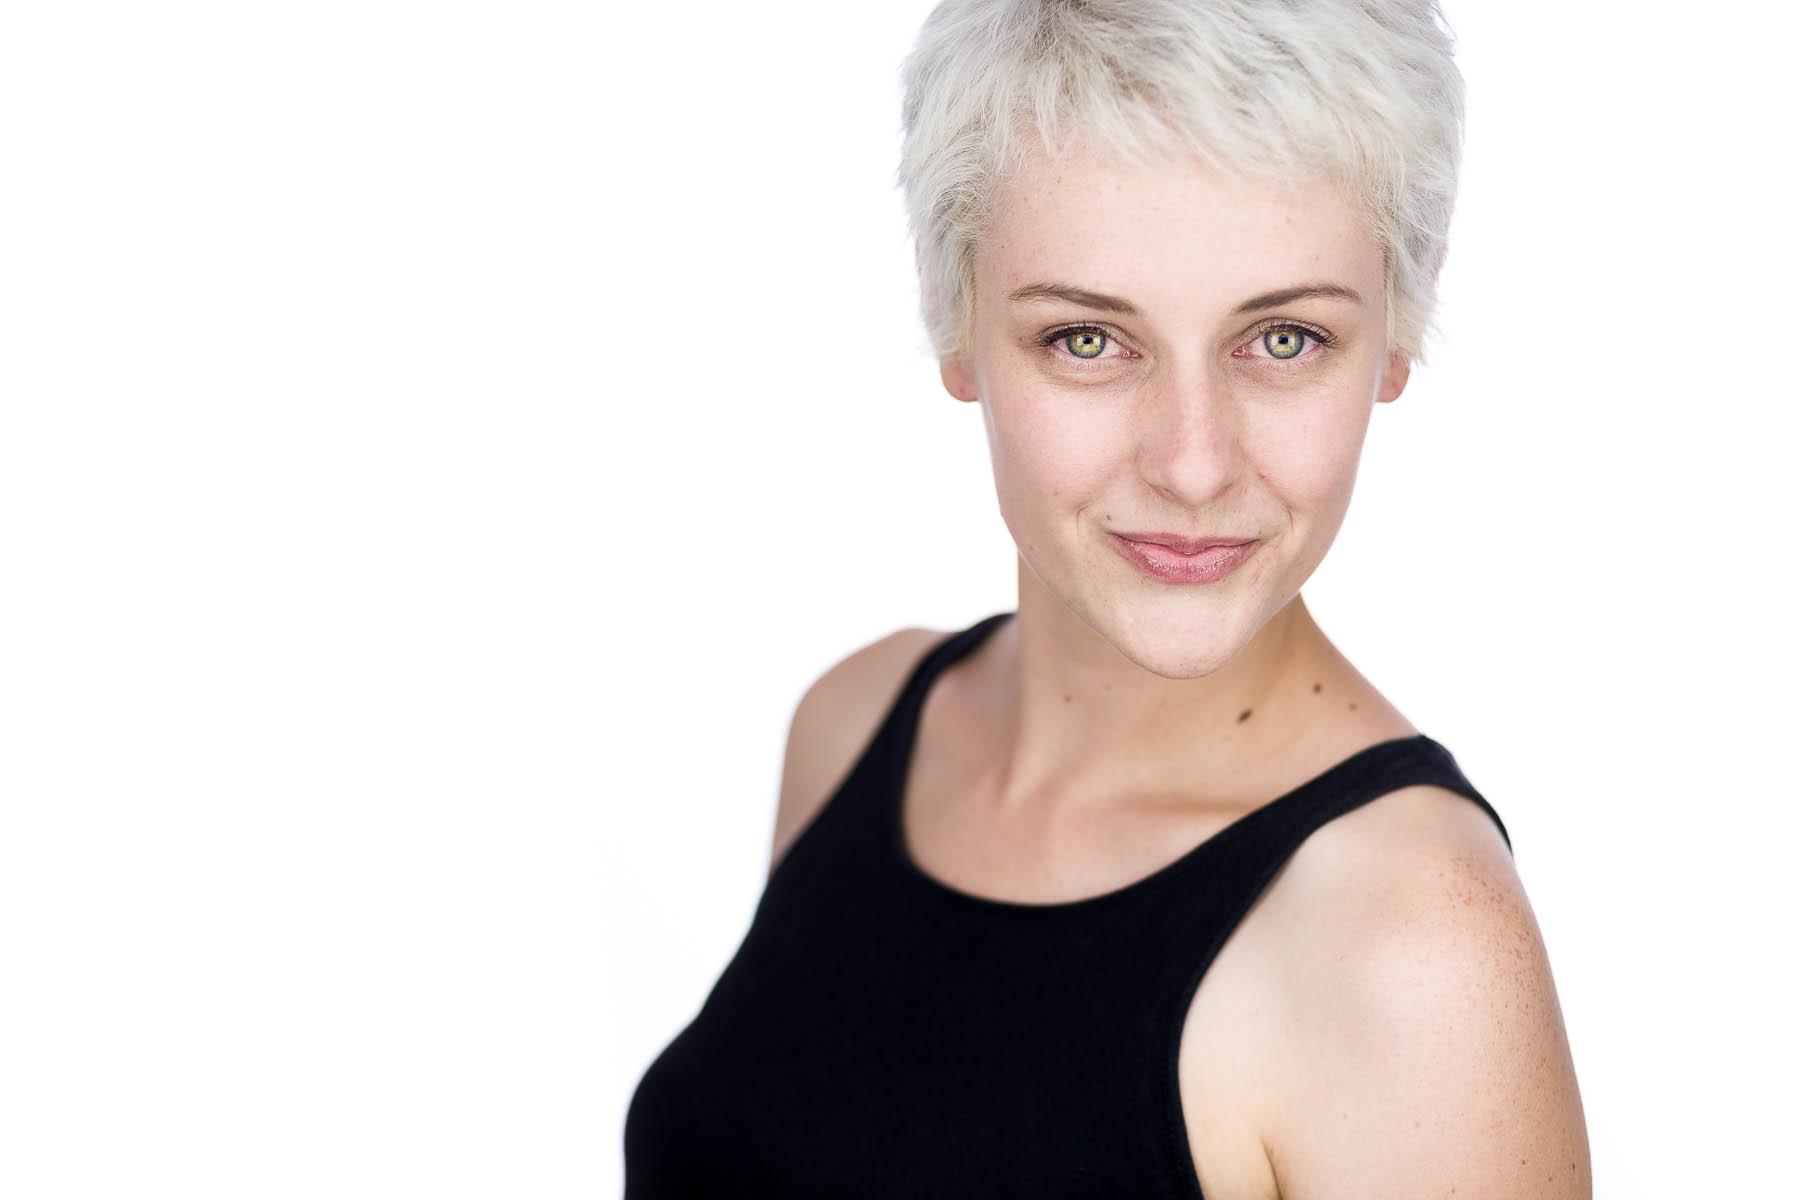 sarah-actor-professional-headshot-session-19.jpg